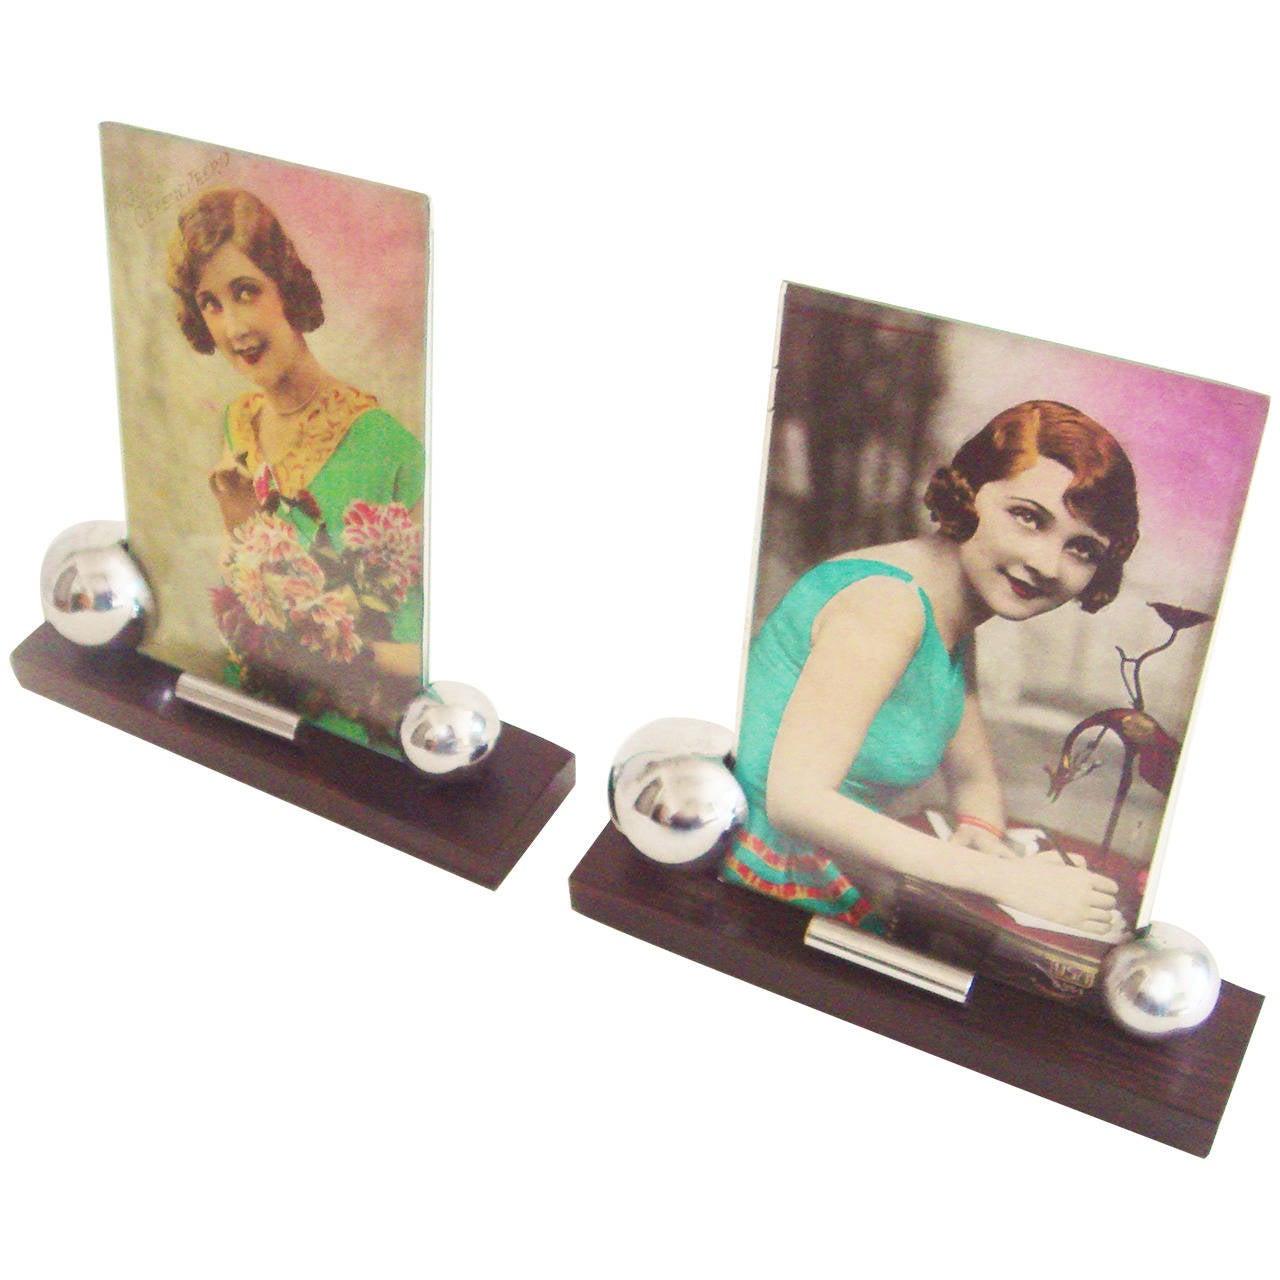 Pair of French Art Deco Macassar Ebony and Chrome Desk Photo Frames